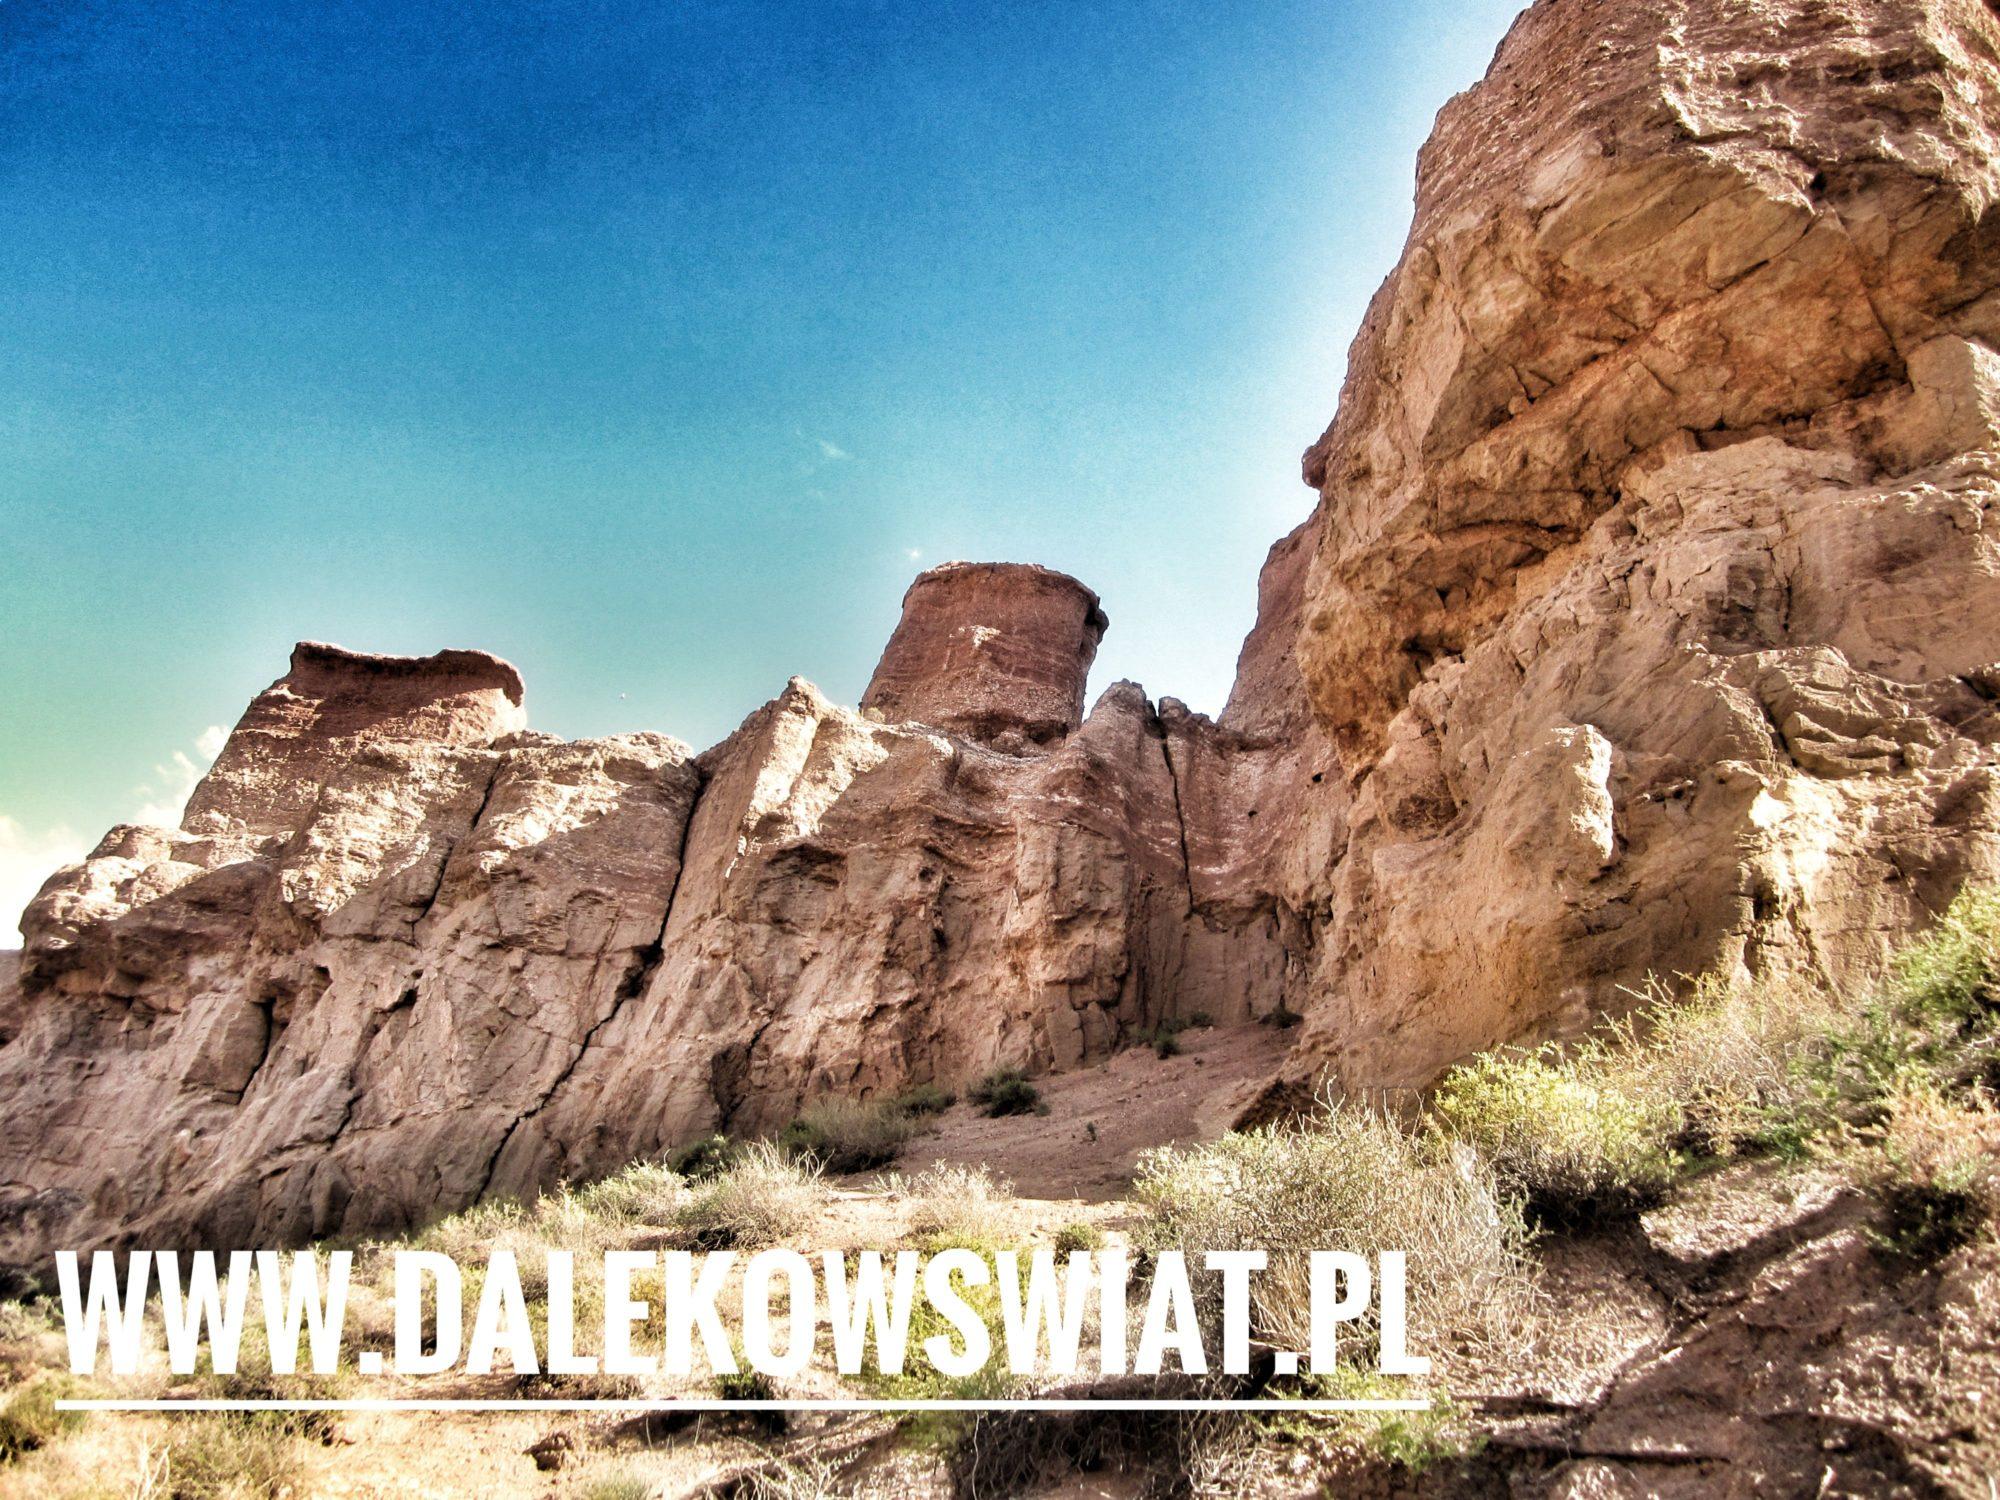 Kanion Szarynski, Charyn Canyon